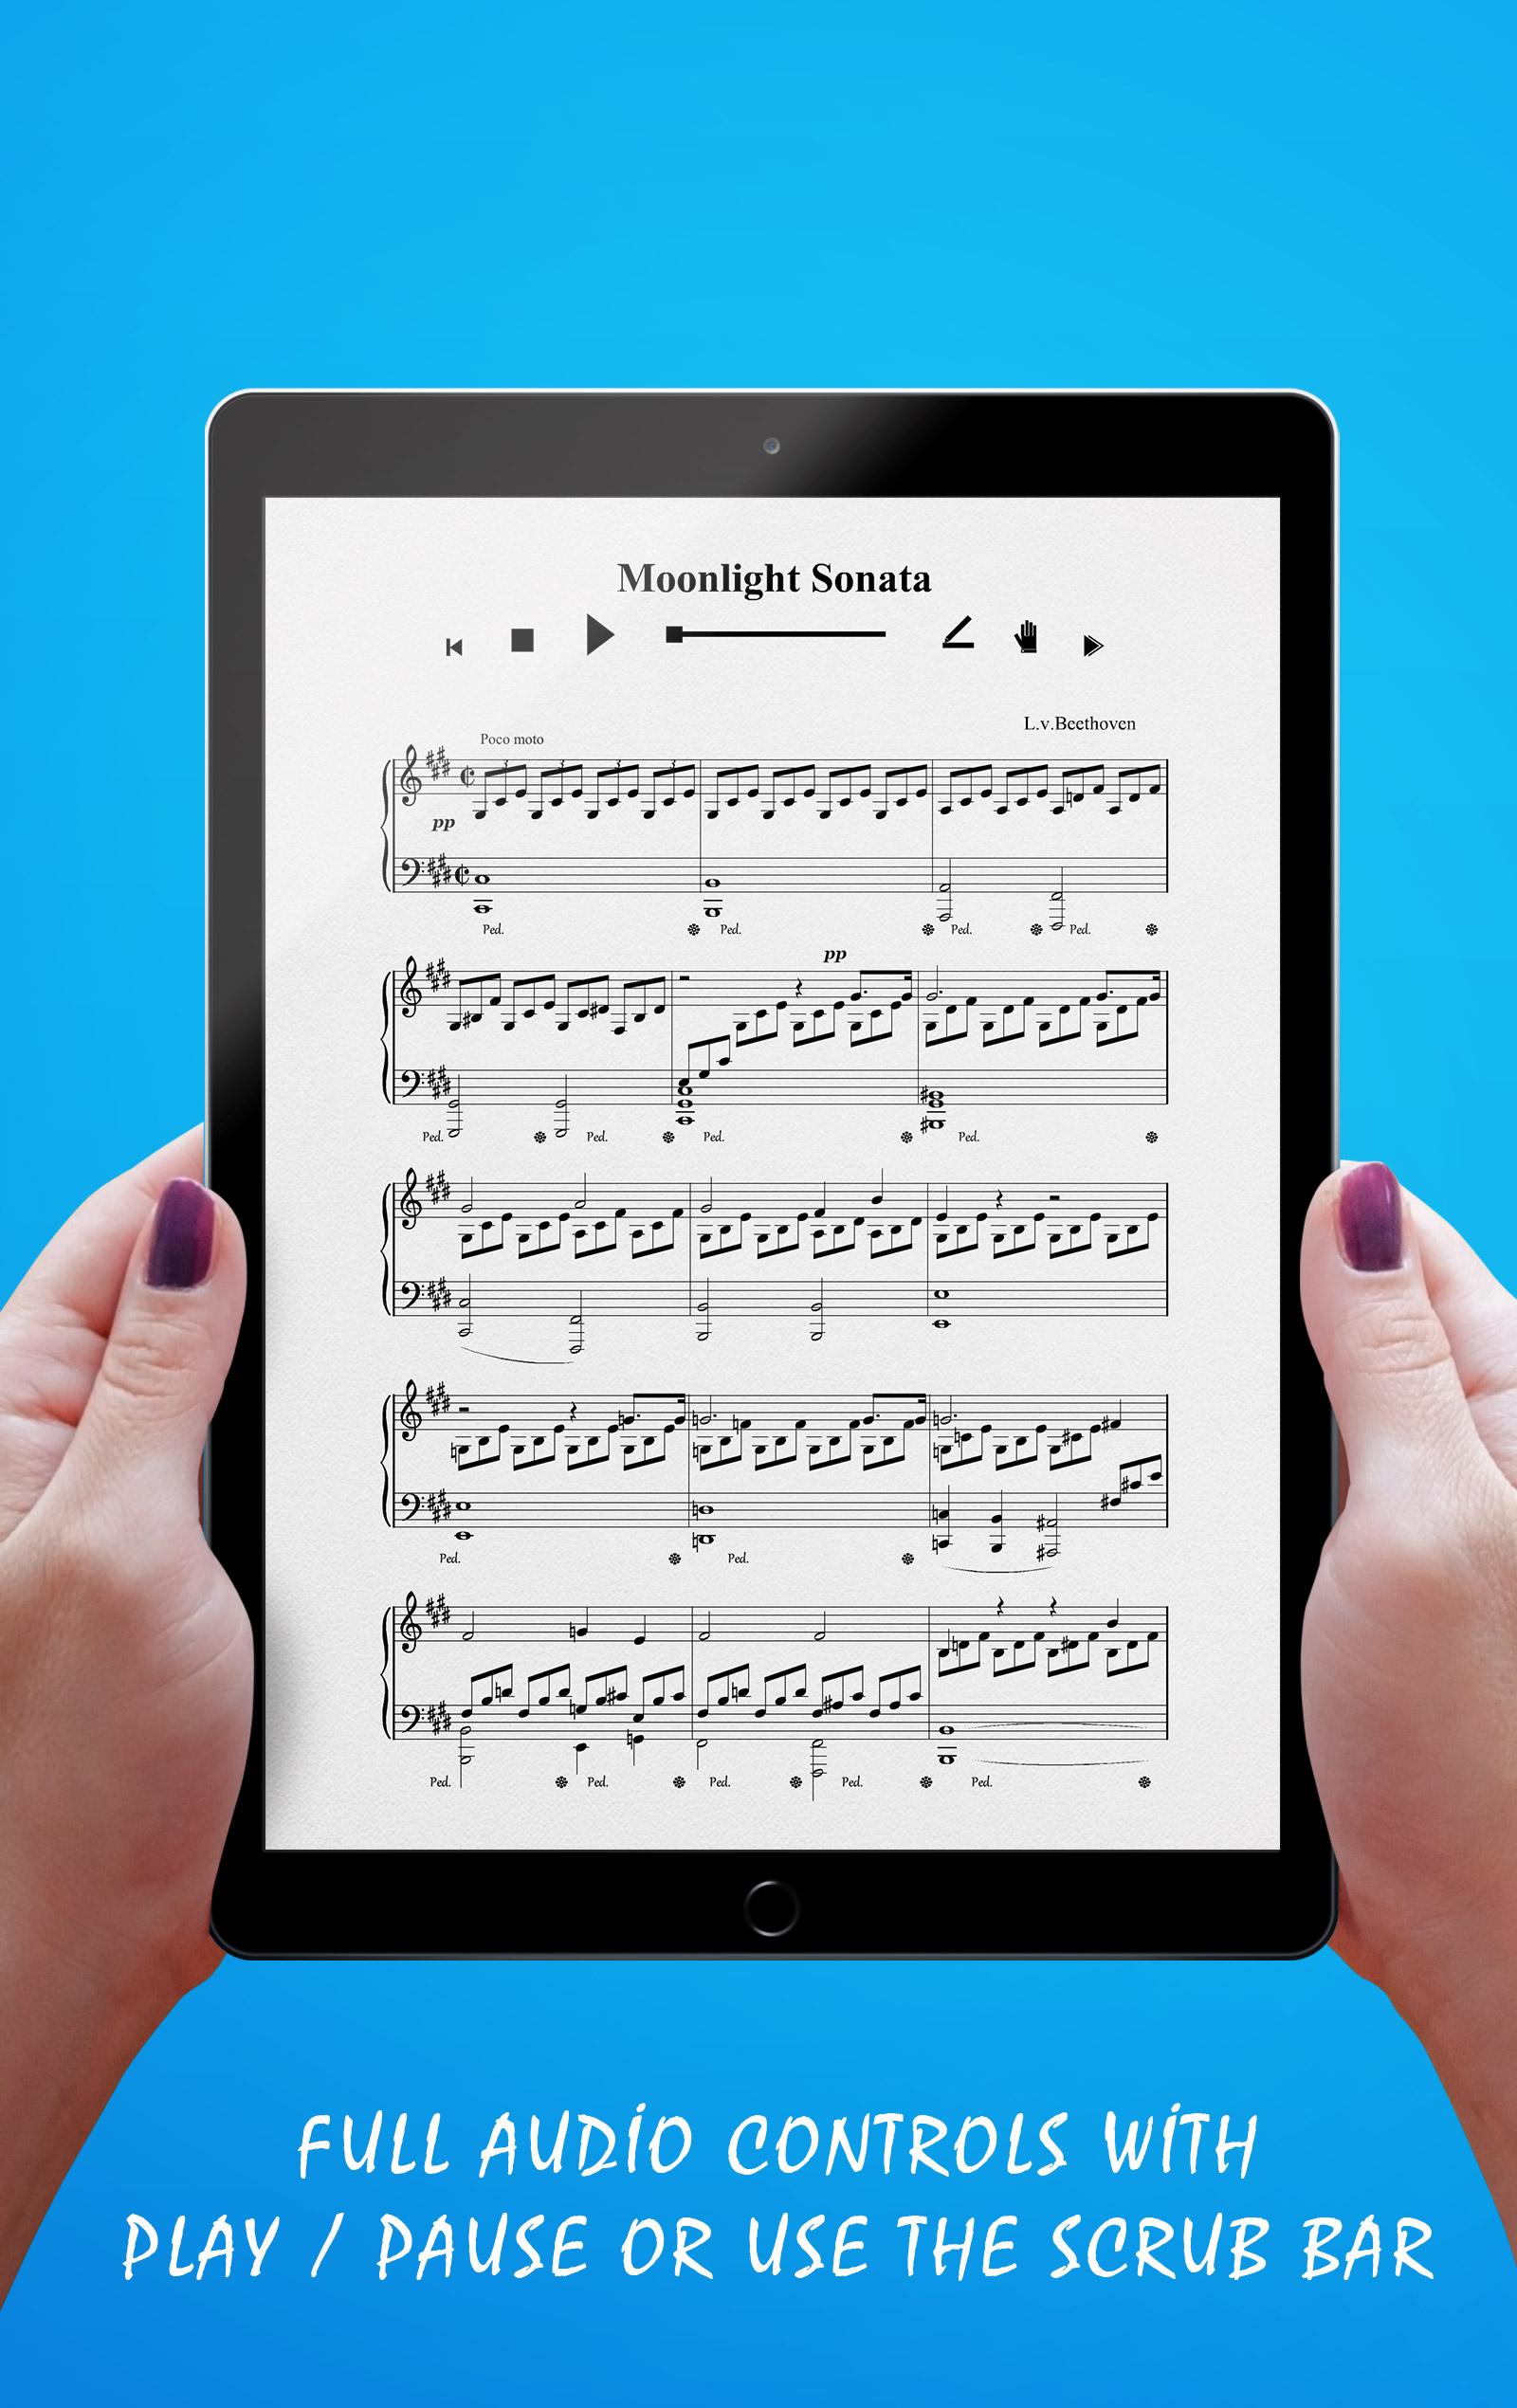 Moonlight Sonata Audio Controls